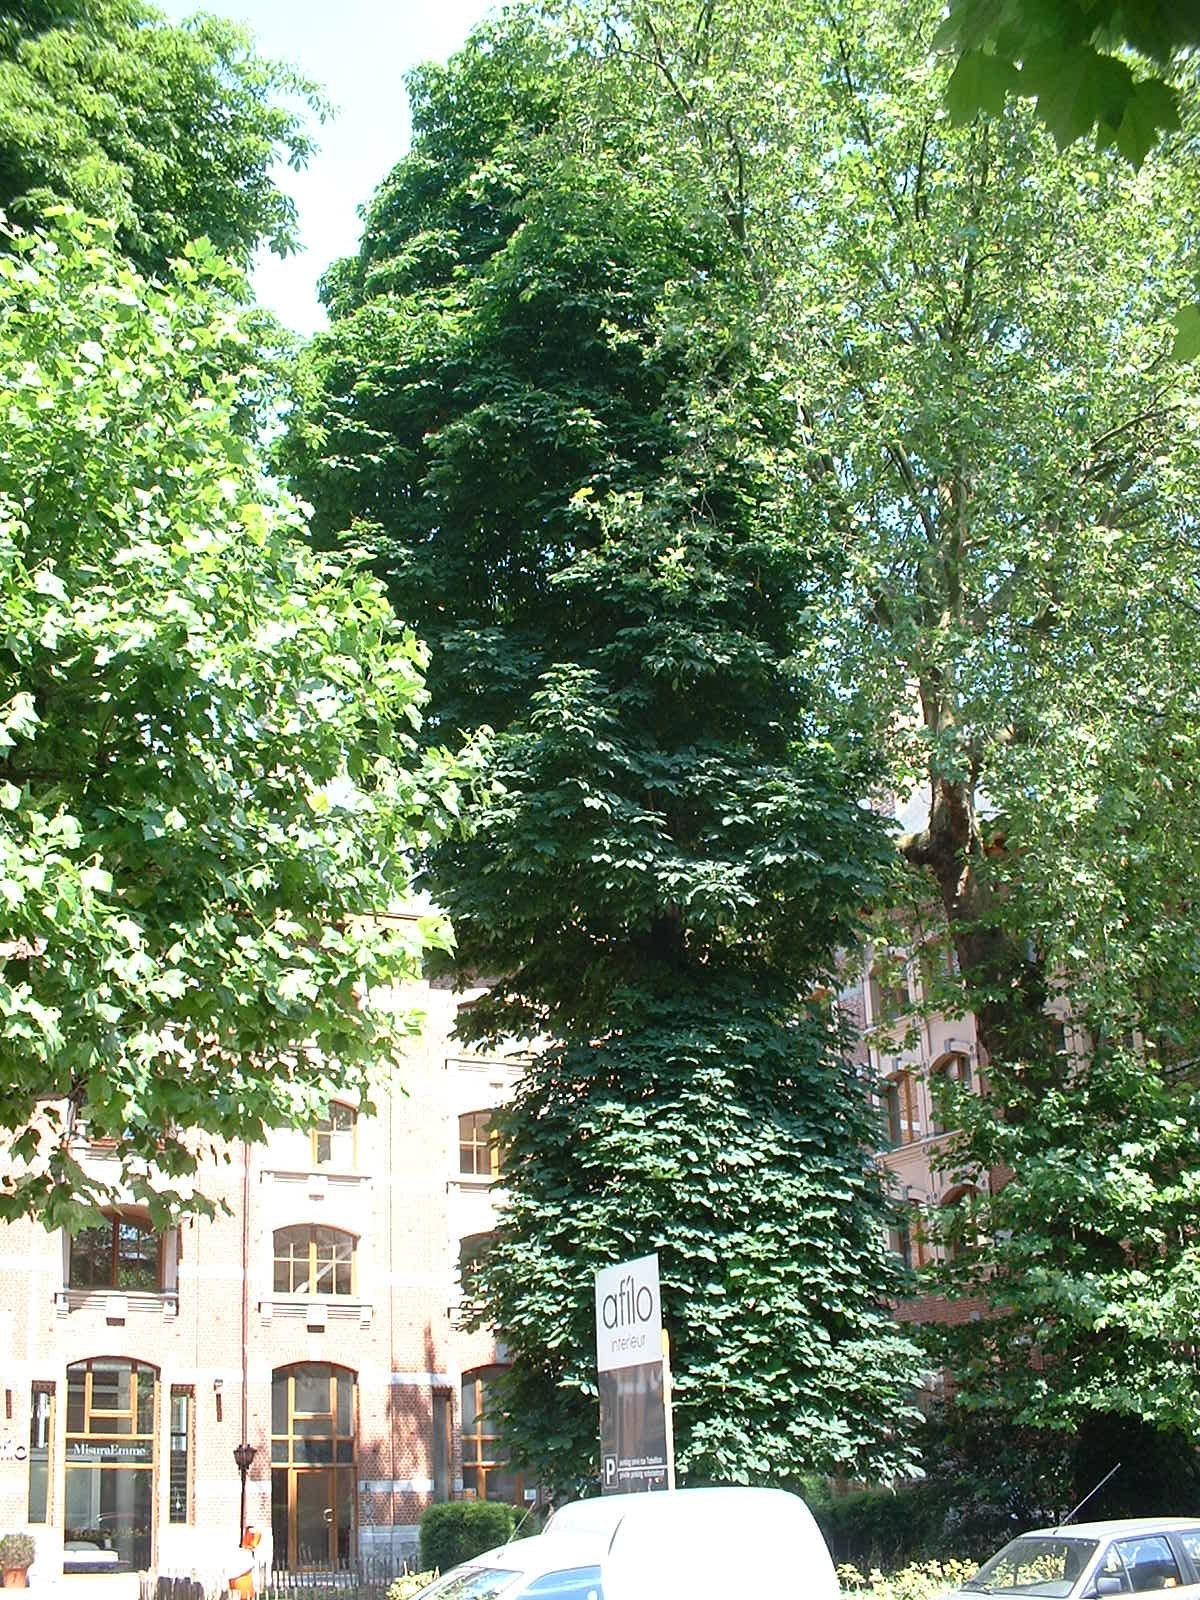 Marronnier commun – Ixelles, Chaussée de Waterloo, 412 –  13 Juin 2003